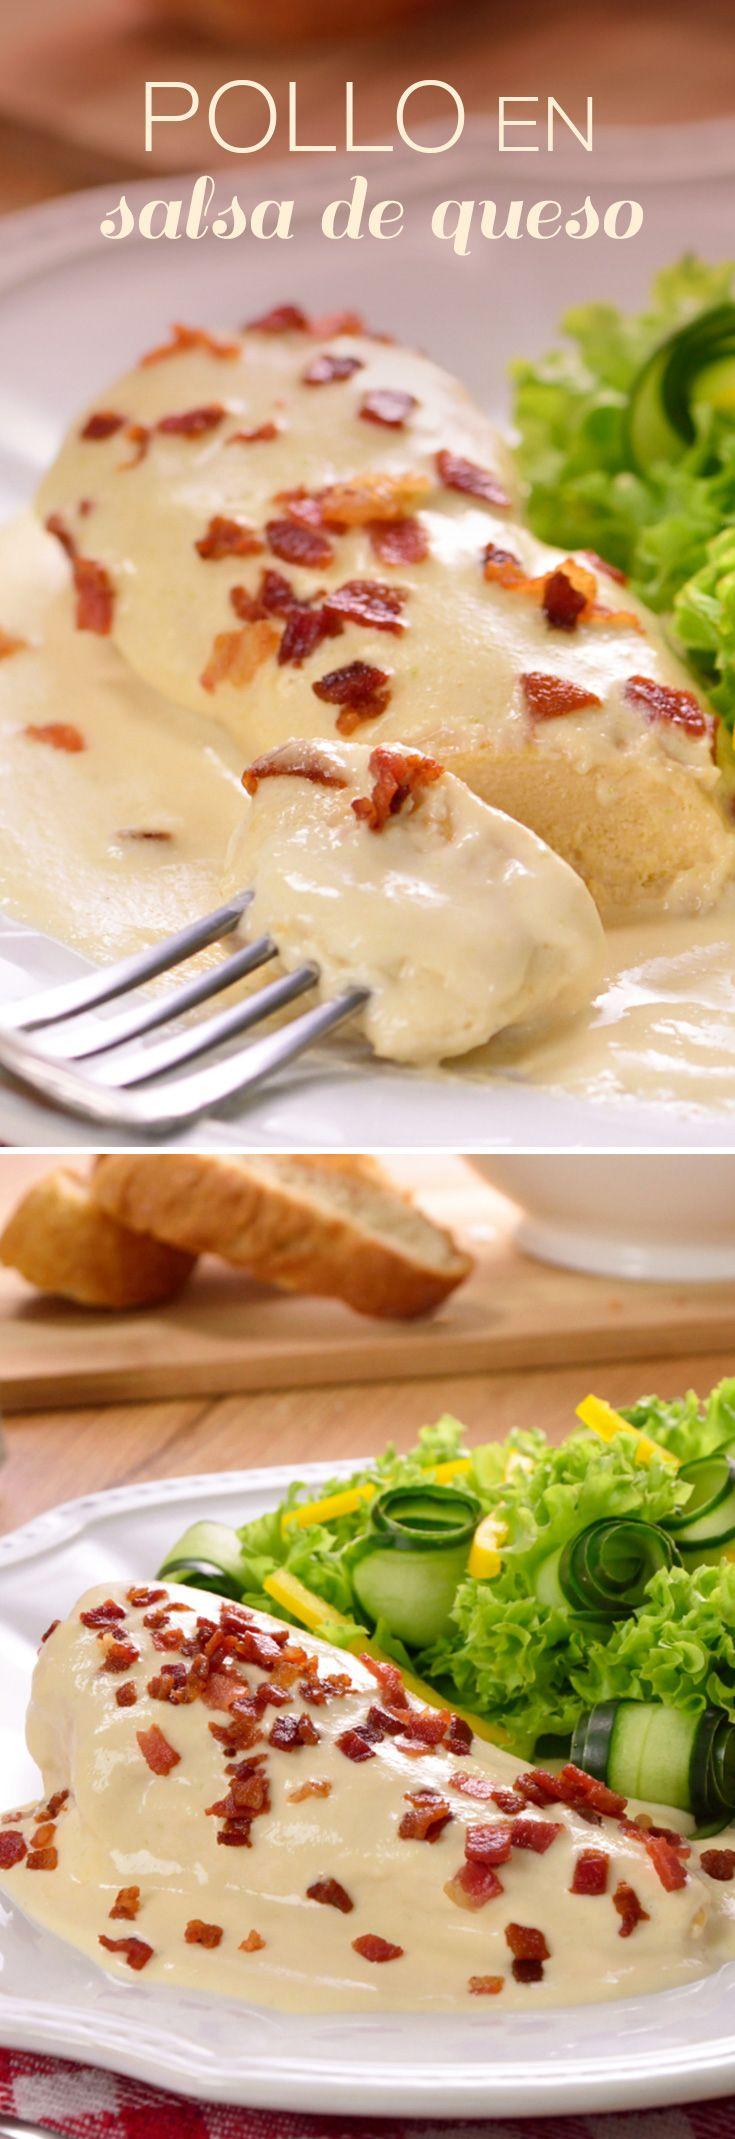 e1d9748ca9e5fc2c90b90342a3bdd665 - Recetas De Cocina Pollo En Salsa